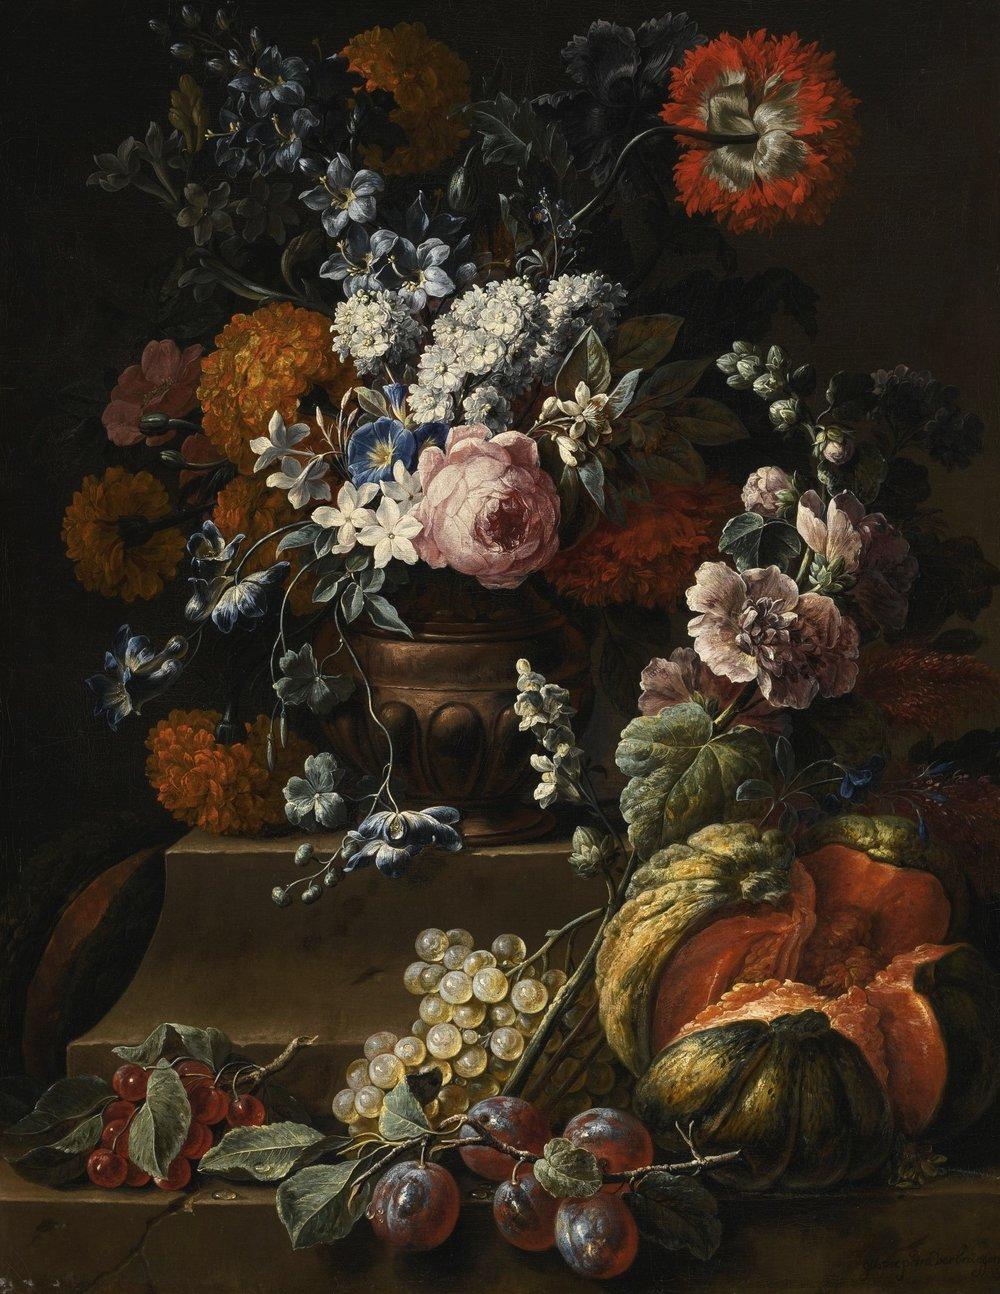 Gaspar Peeter Verbruggen II, 1664–1730